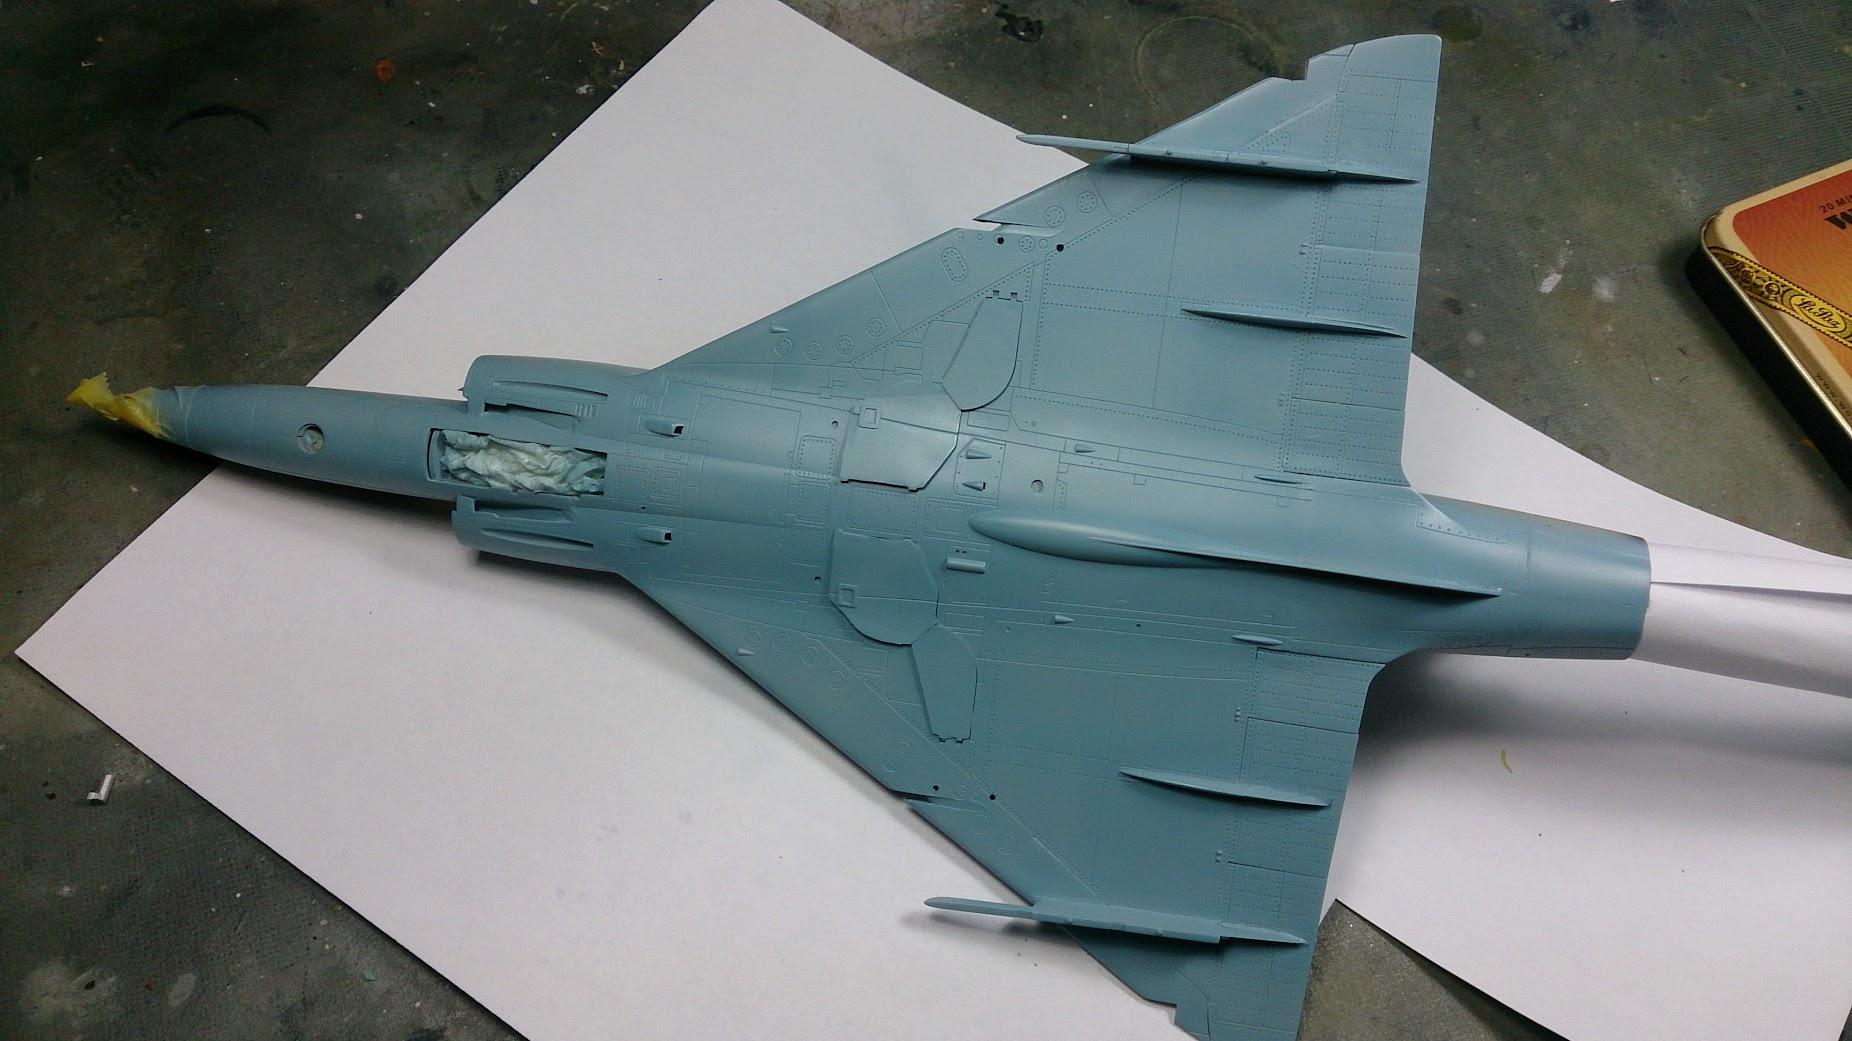 Avion - Mirage IIIC - Hobby Boss, 1/48 NblAKm-YanpfLtHopQOB4WXRFH84FA9r47F6UjibROvhgwejo1cxhB8nolWoedxpUIu3Jeq8H_TkRcTsMXkq7eqV8XOhyNl73XO8p0ZuJij-Rk05vQDLsTSq2yvLy860_ajx1suDLumhyZcXR_06NBHLsO6gvhNB5igHJQOGMVXQ7BfoukXEOXsj3Mgvzi_ZuQg_OyHaJQrKckd--8YAeDD-ouzG5FaClTDhCri08kht3lJrqzuD5mSFq67qJBleU4Rg3mtopGUa2ijTZgCkyei38NlSEdbltl5bkTtGeQDN0iV0TE3EADJrH_j3KJo0mvilZOwGenbAJuDnSqQBbGtQ4Bc9cl3_o7uHxiBH-u9NpLitXeIM9TJ5DumFR8CVf6QinnZ855PWbBDI5c2xeLspTFuaKVpmkIPN0uoBo4Wy4evyj_3vgoYgm5levvUQpSV9XfVrxUmrPICxjPlqDiOfKLGI_rBYpZwWaERp9HKsRADE_k4RpvalroVIxiCF84VNTAacn7dyfhjWKna9Y6CQNfusuNYIj3GeI93xau4=w1852-h1041-no